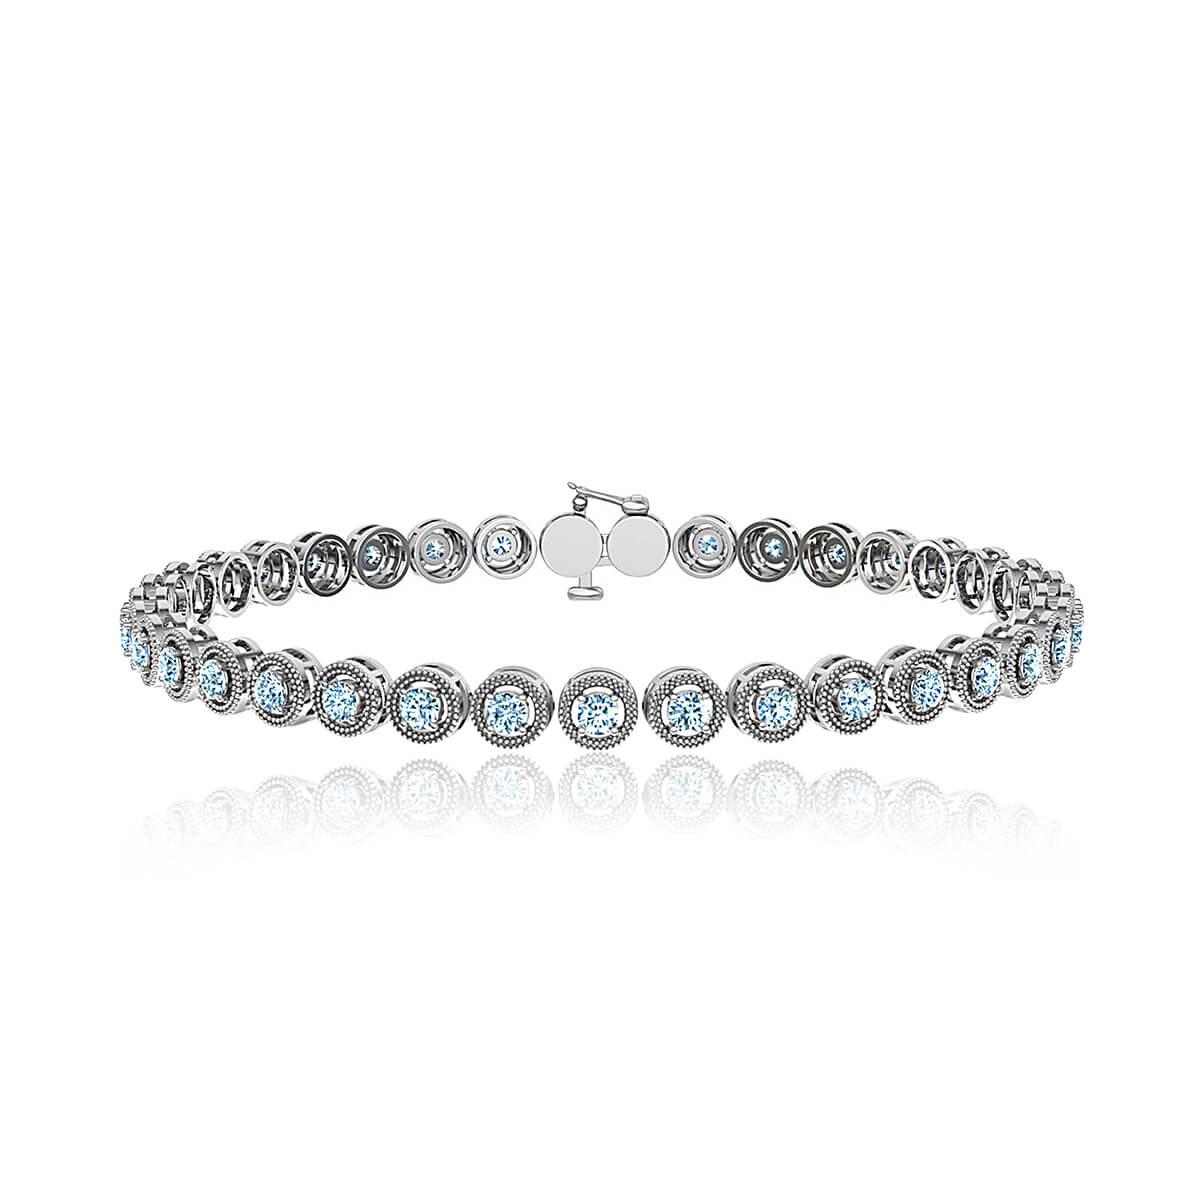 Fleur Diamond Milgrain Tennis Bracelet (1 CT. TW.)